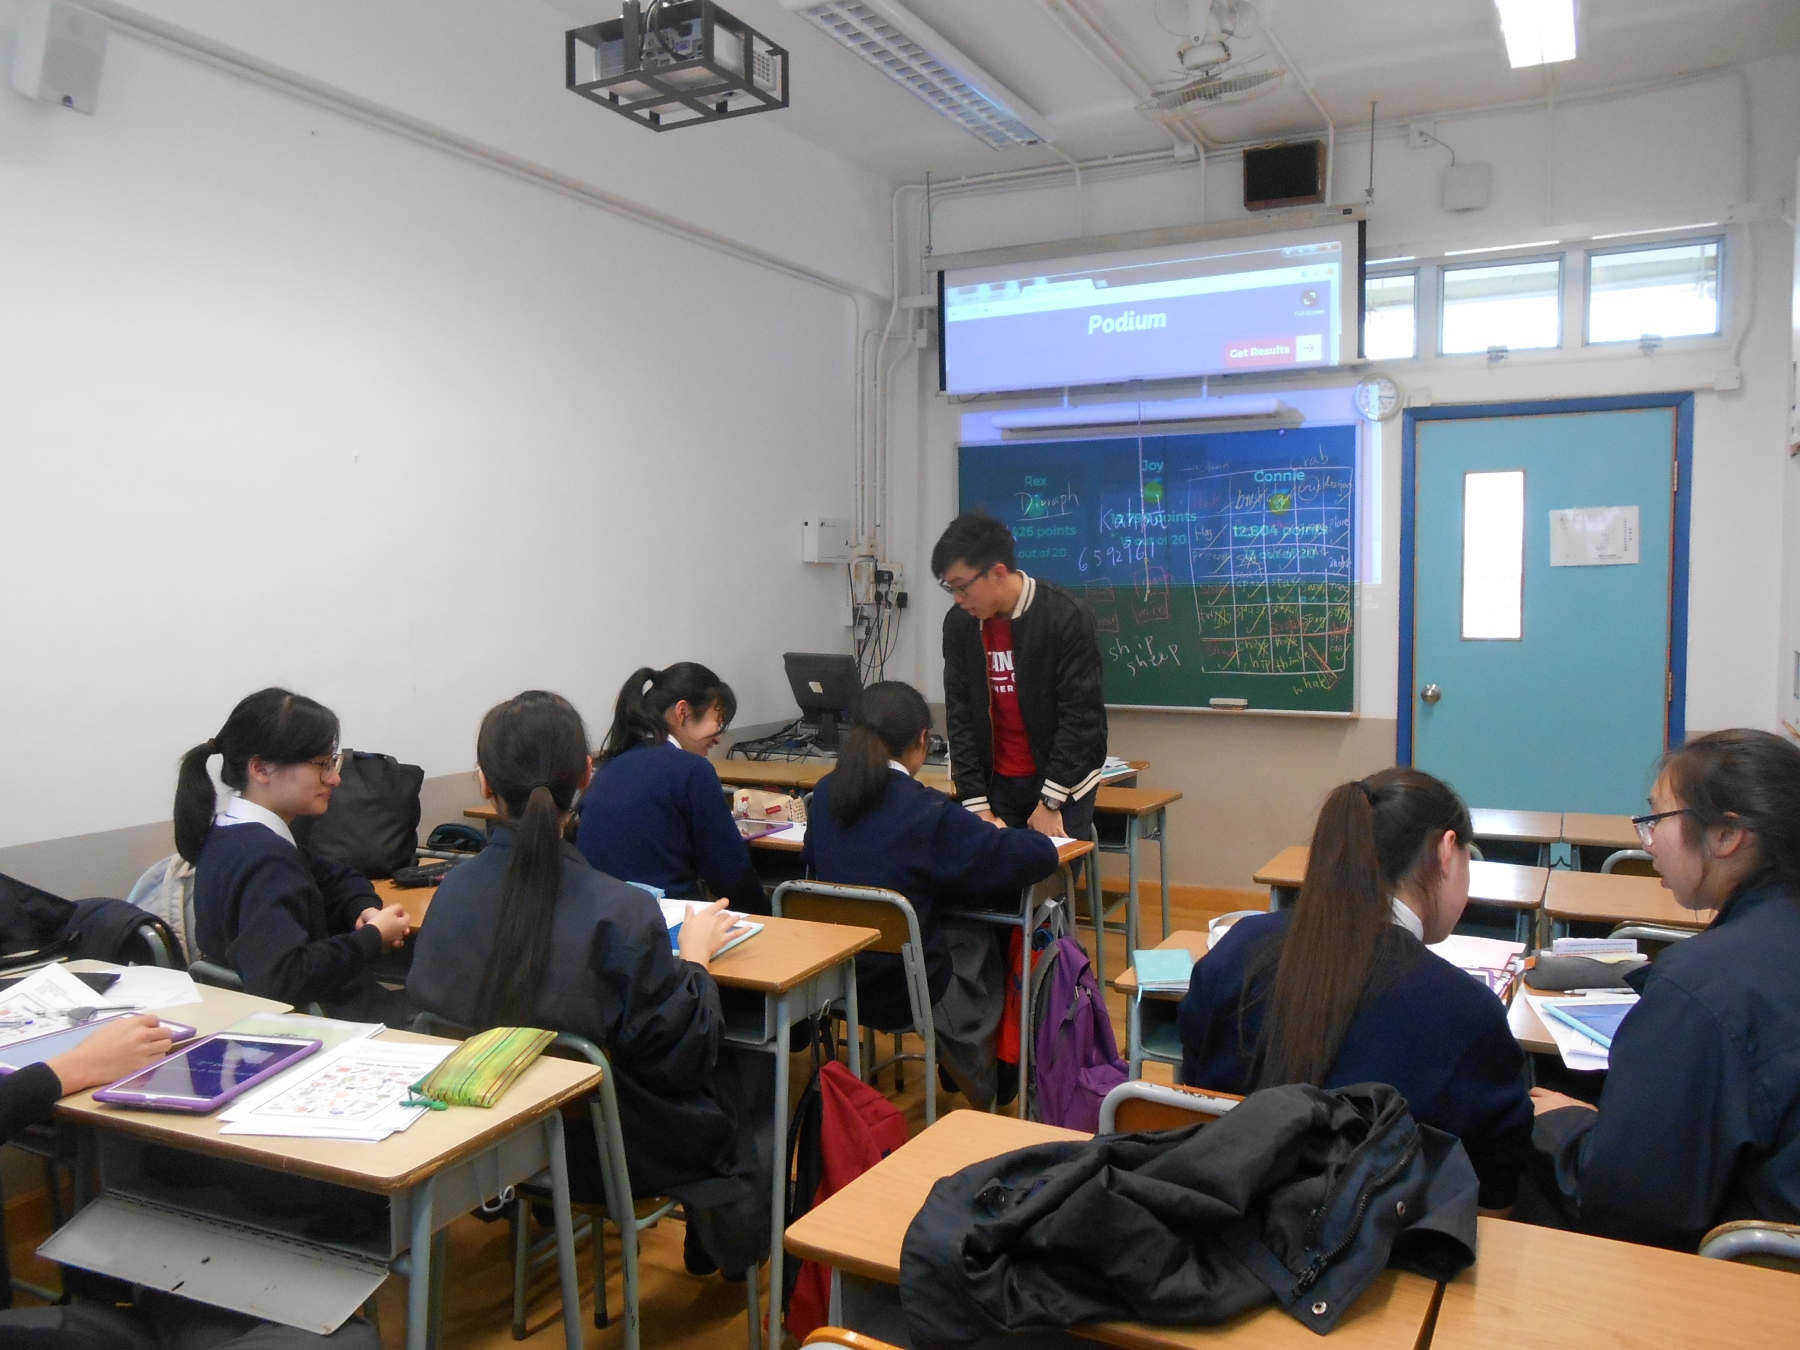 http://npc.edu.hk/sites/default/files/dscn9605.jpg